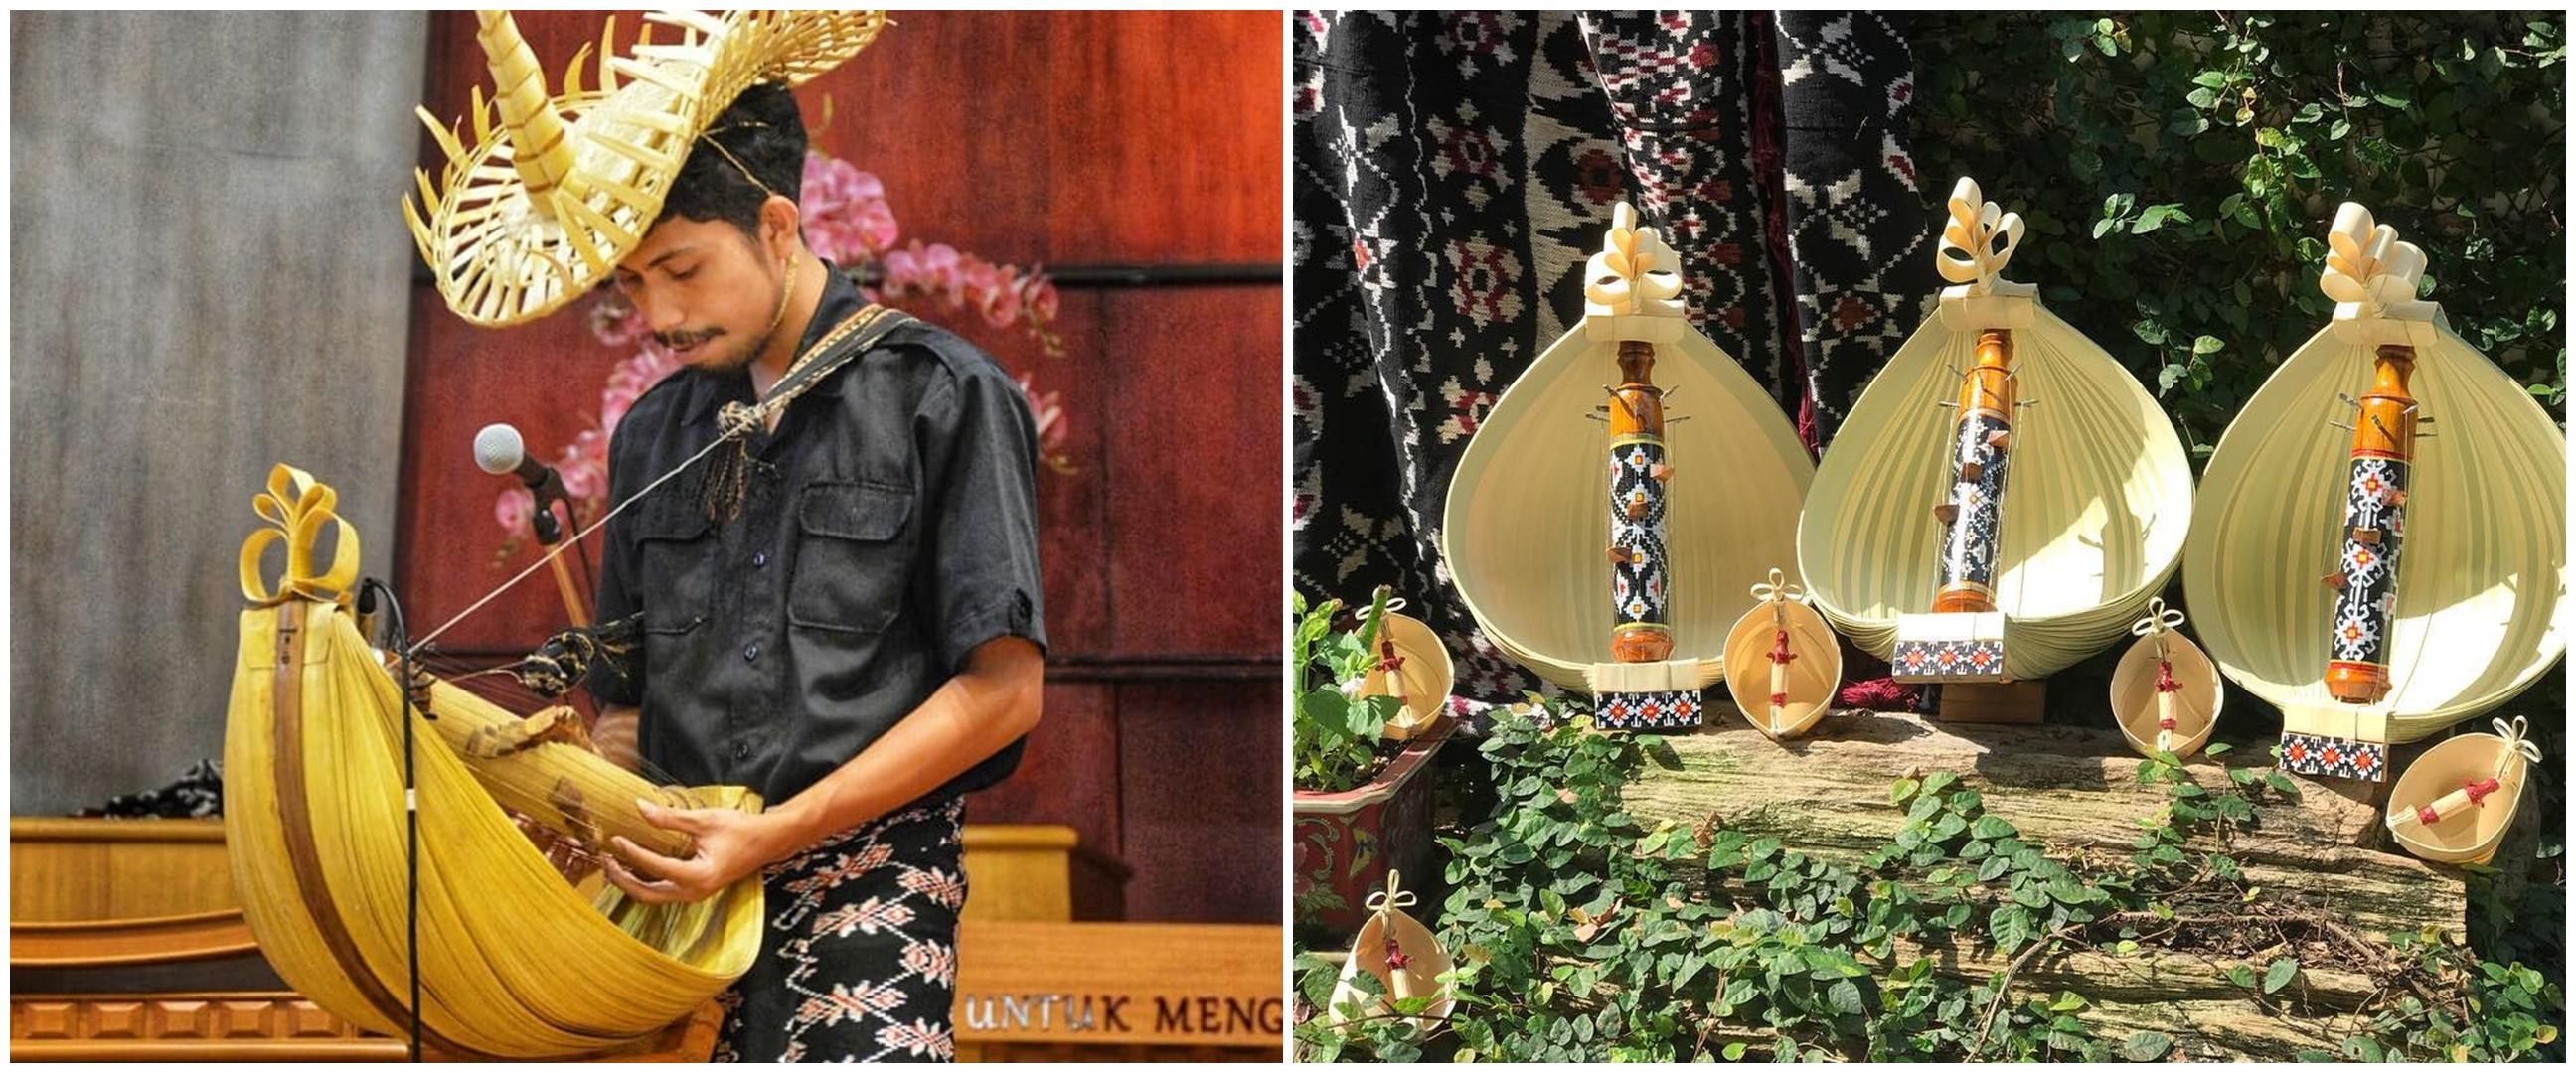 Mengenal alat musik Sasando, khas Pulau Rote